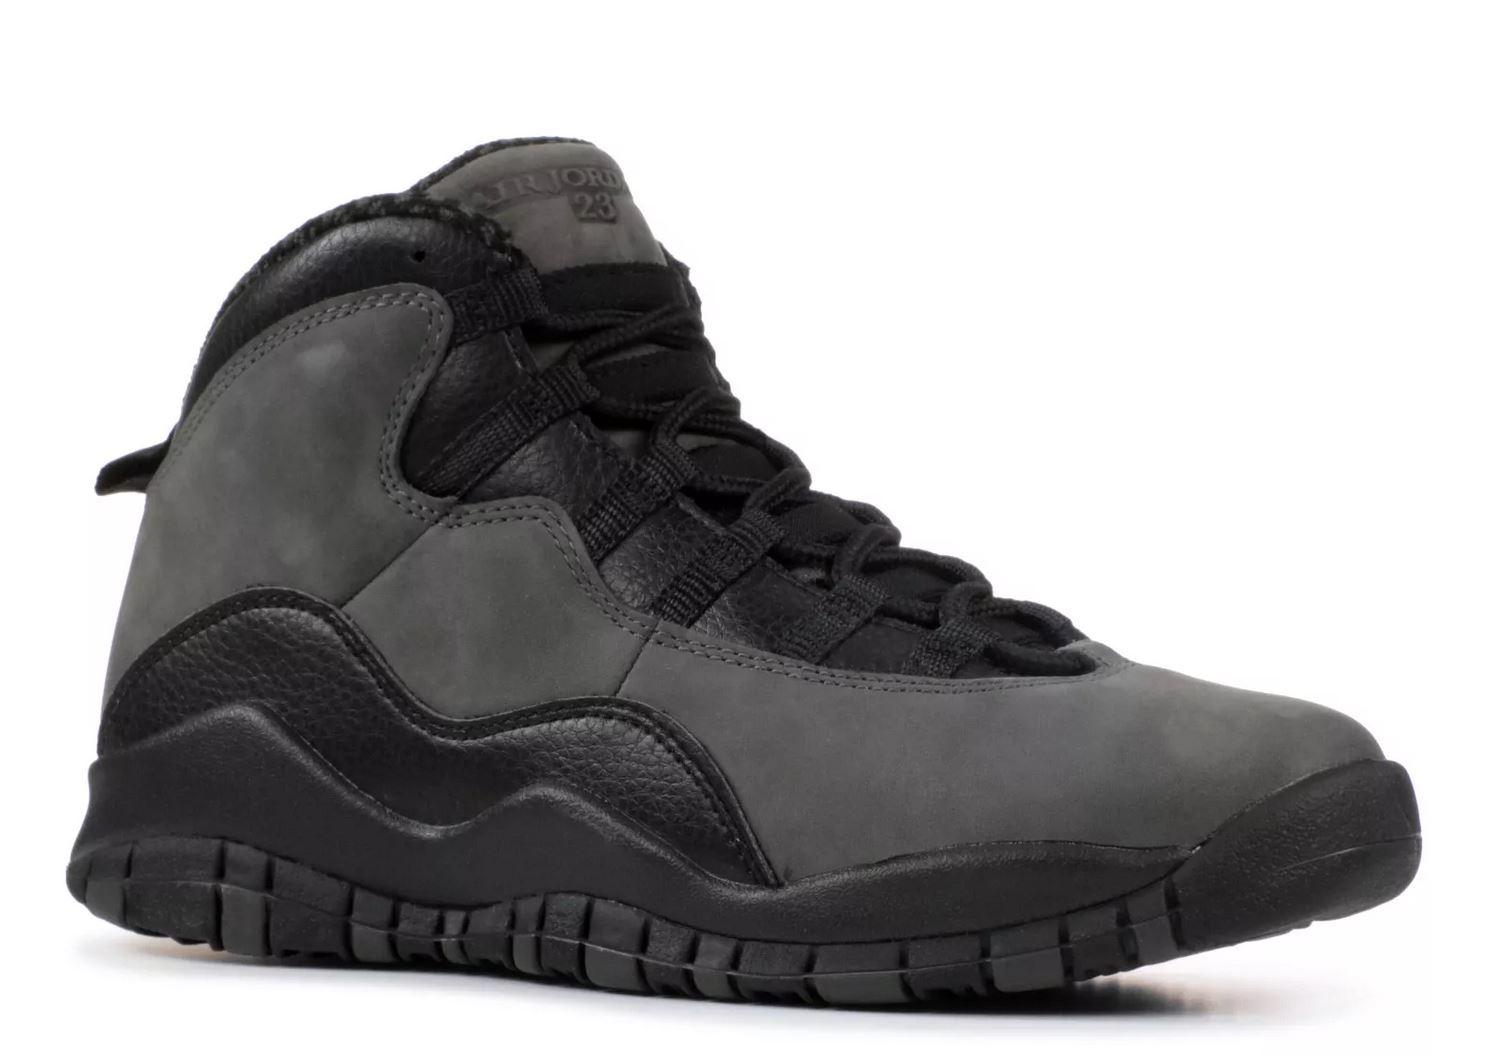 310806-002 Kids Retro Dark Shadow 10 Air Jordan X